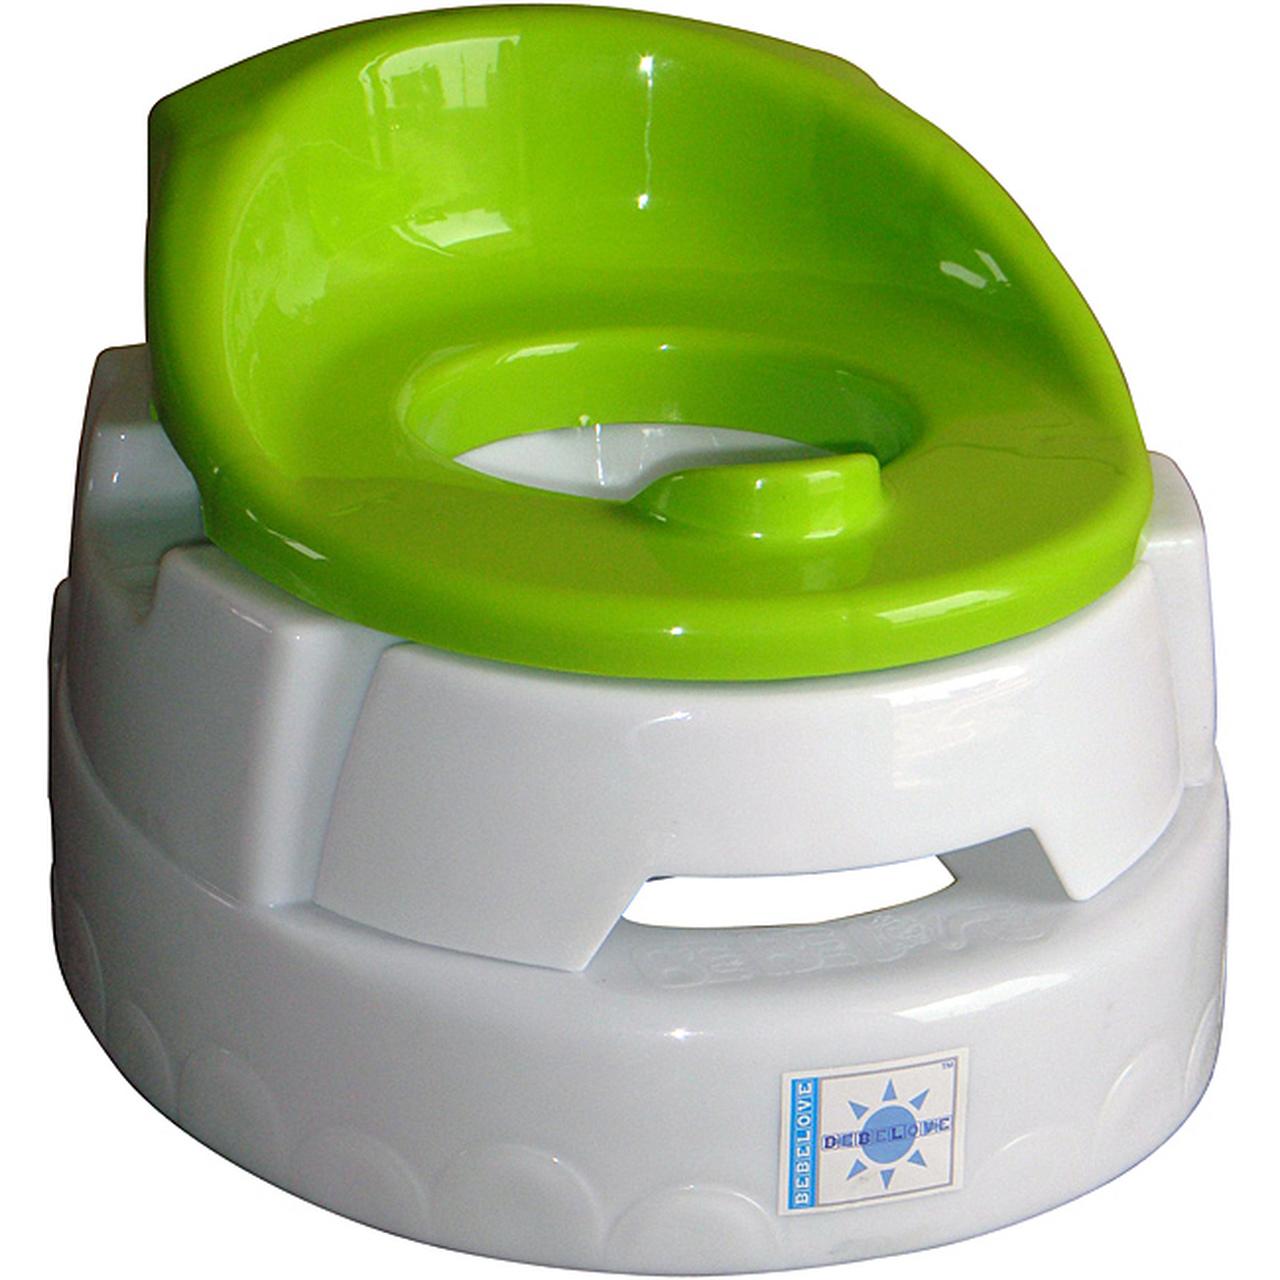 BeBeLove Travel Training Toilet Compact Lolli Potty - Black